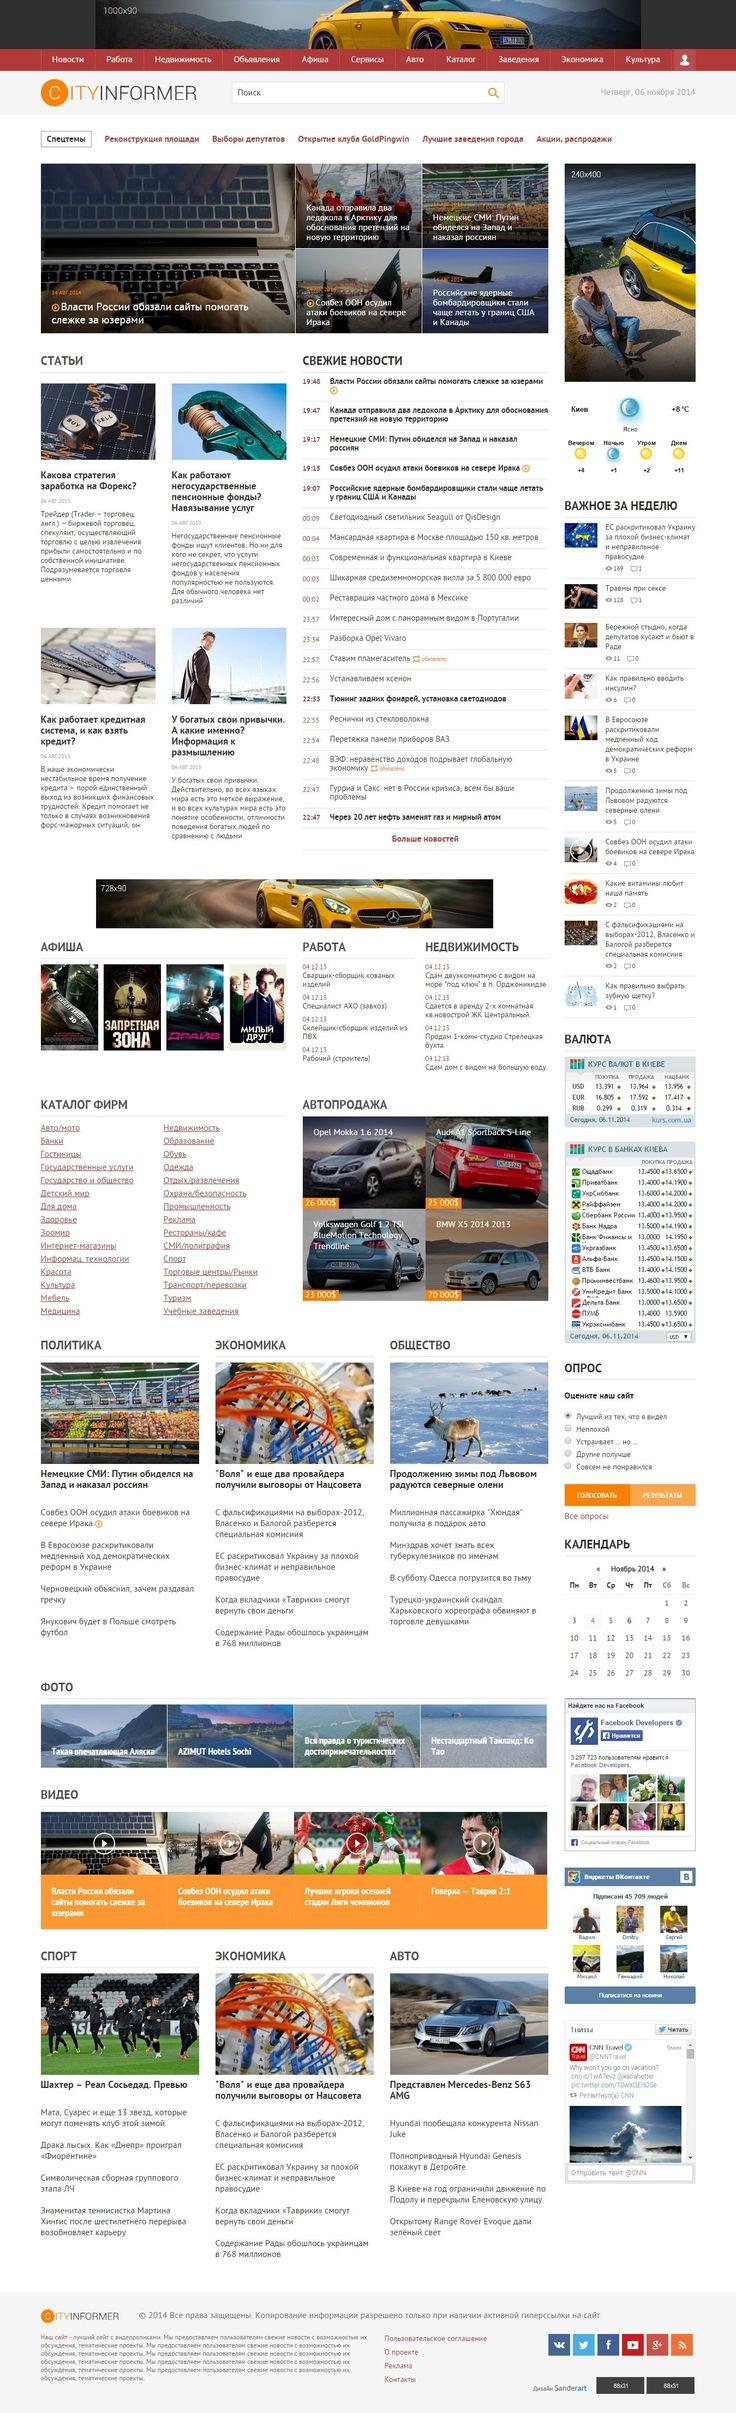 CityInformer - адаптивный новостной шаблон для DLE #templates #website #шаблон #сайт #web